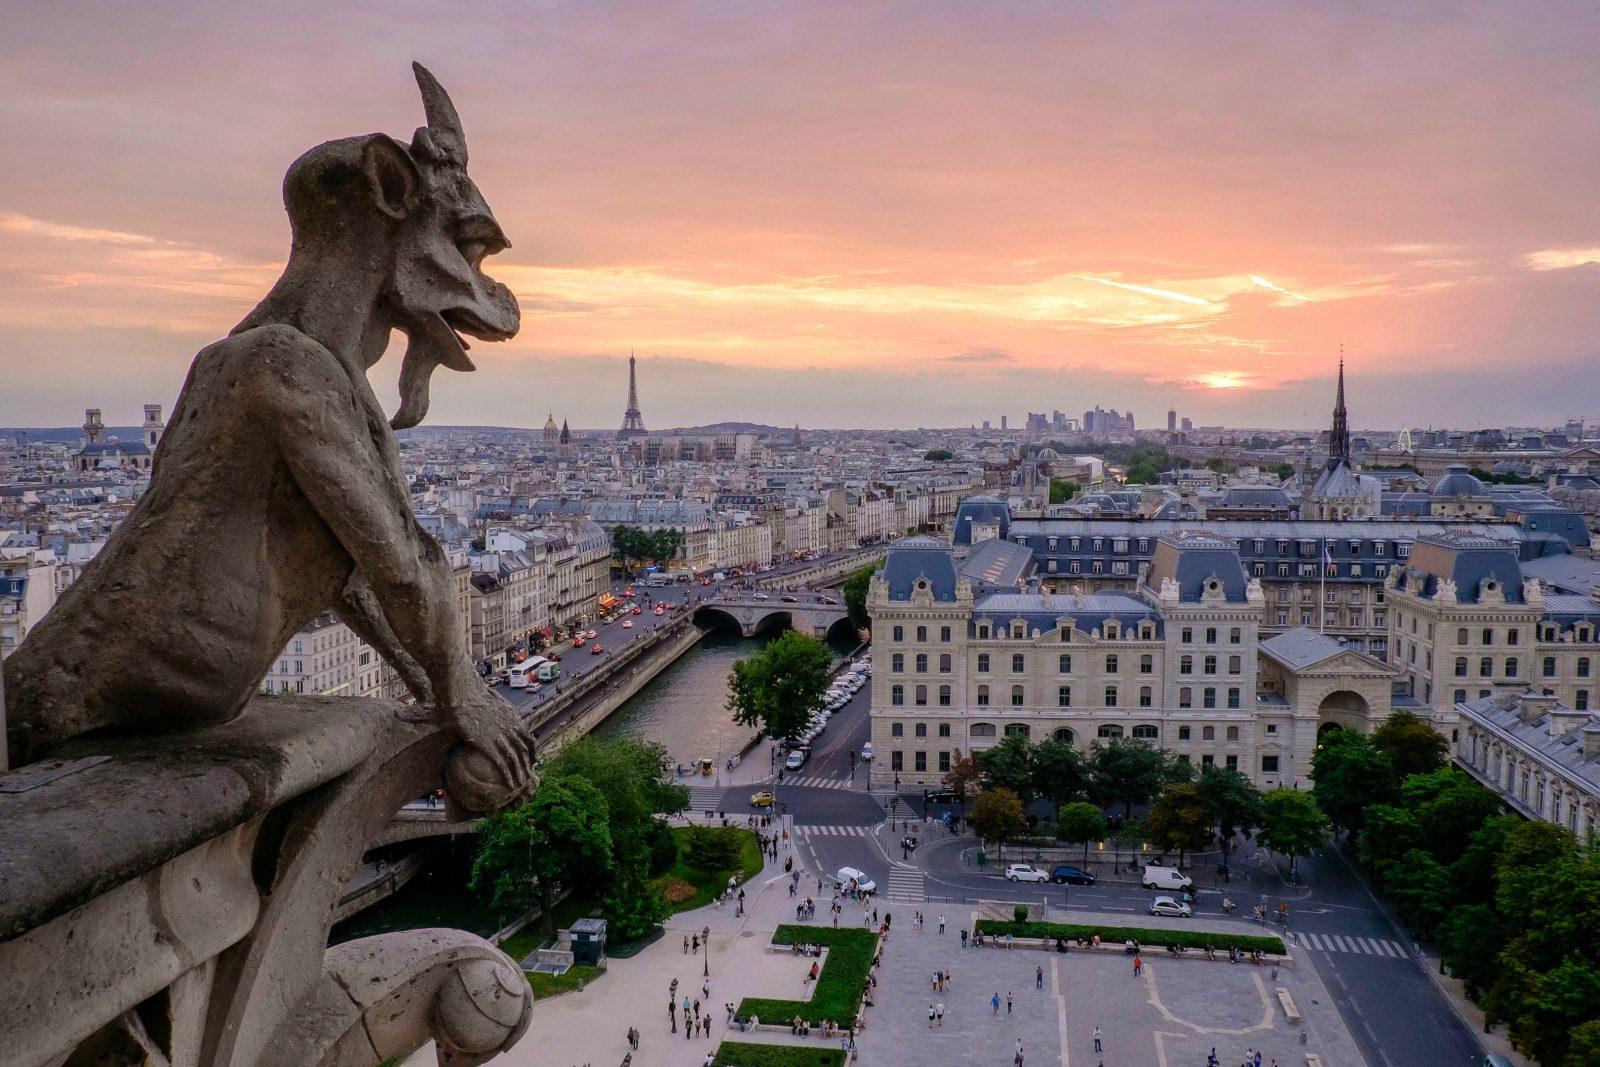 city view of paris